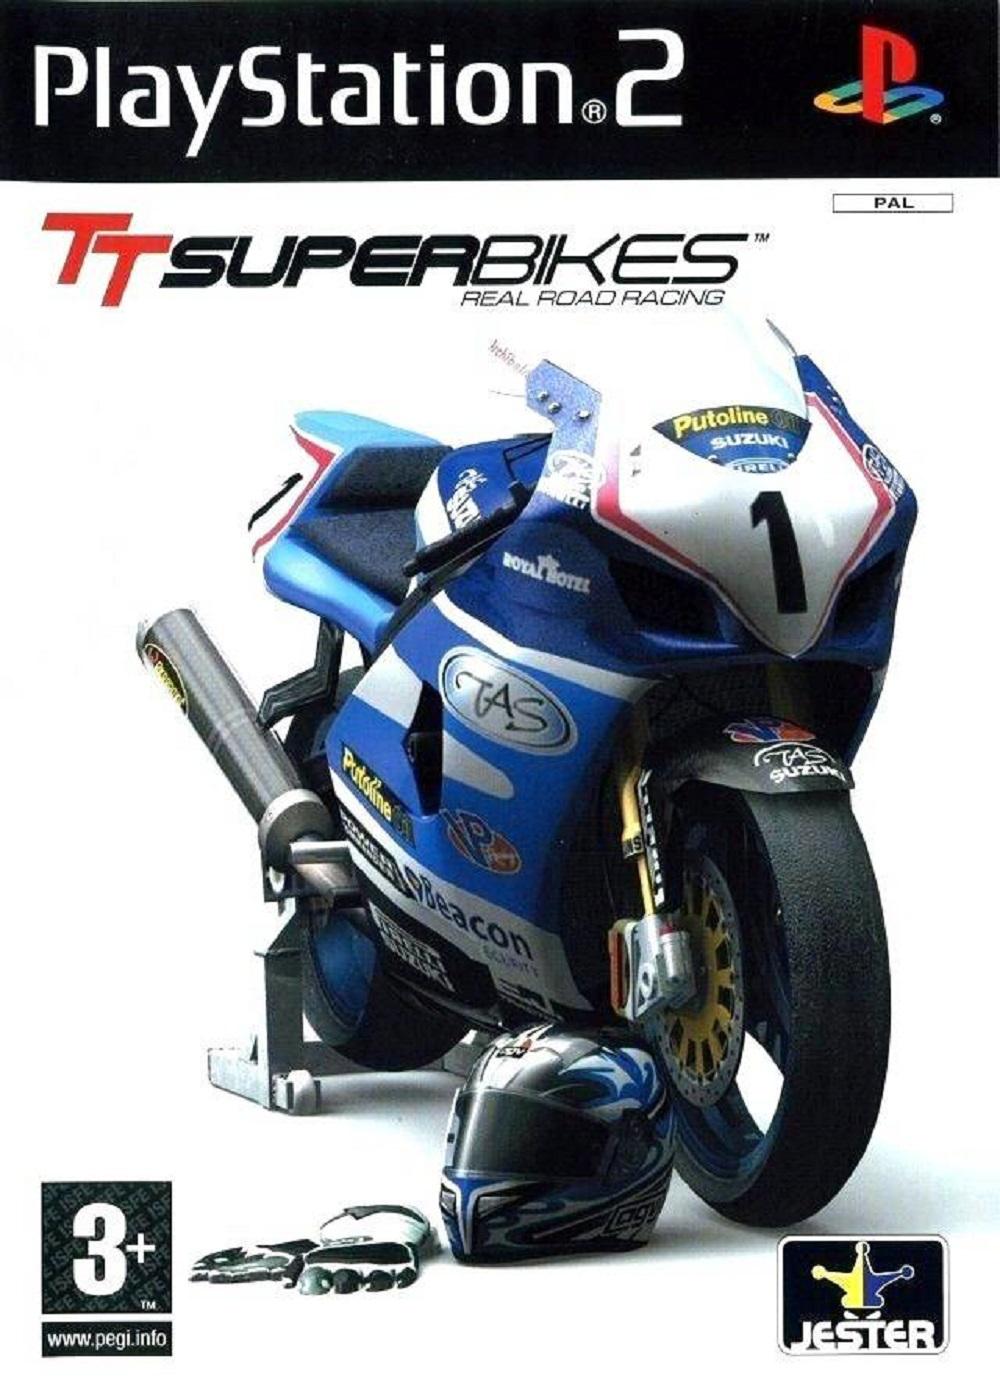 TT Superbikes Real Road Racing - PlayStation 2 Játékok